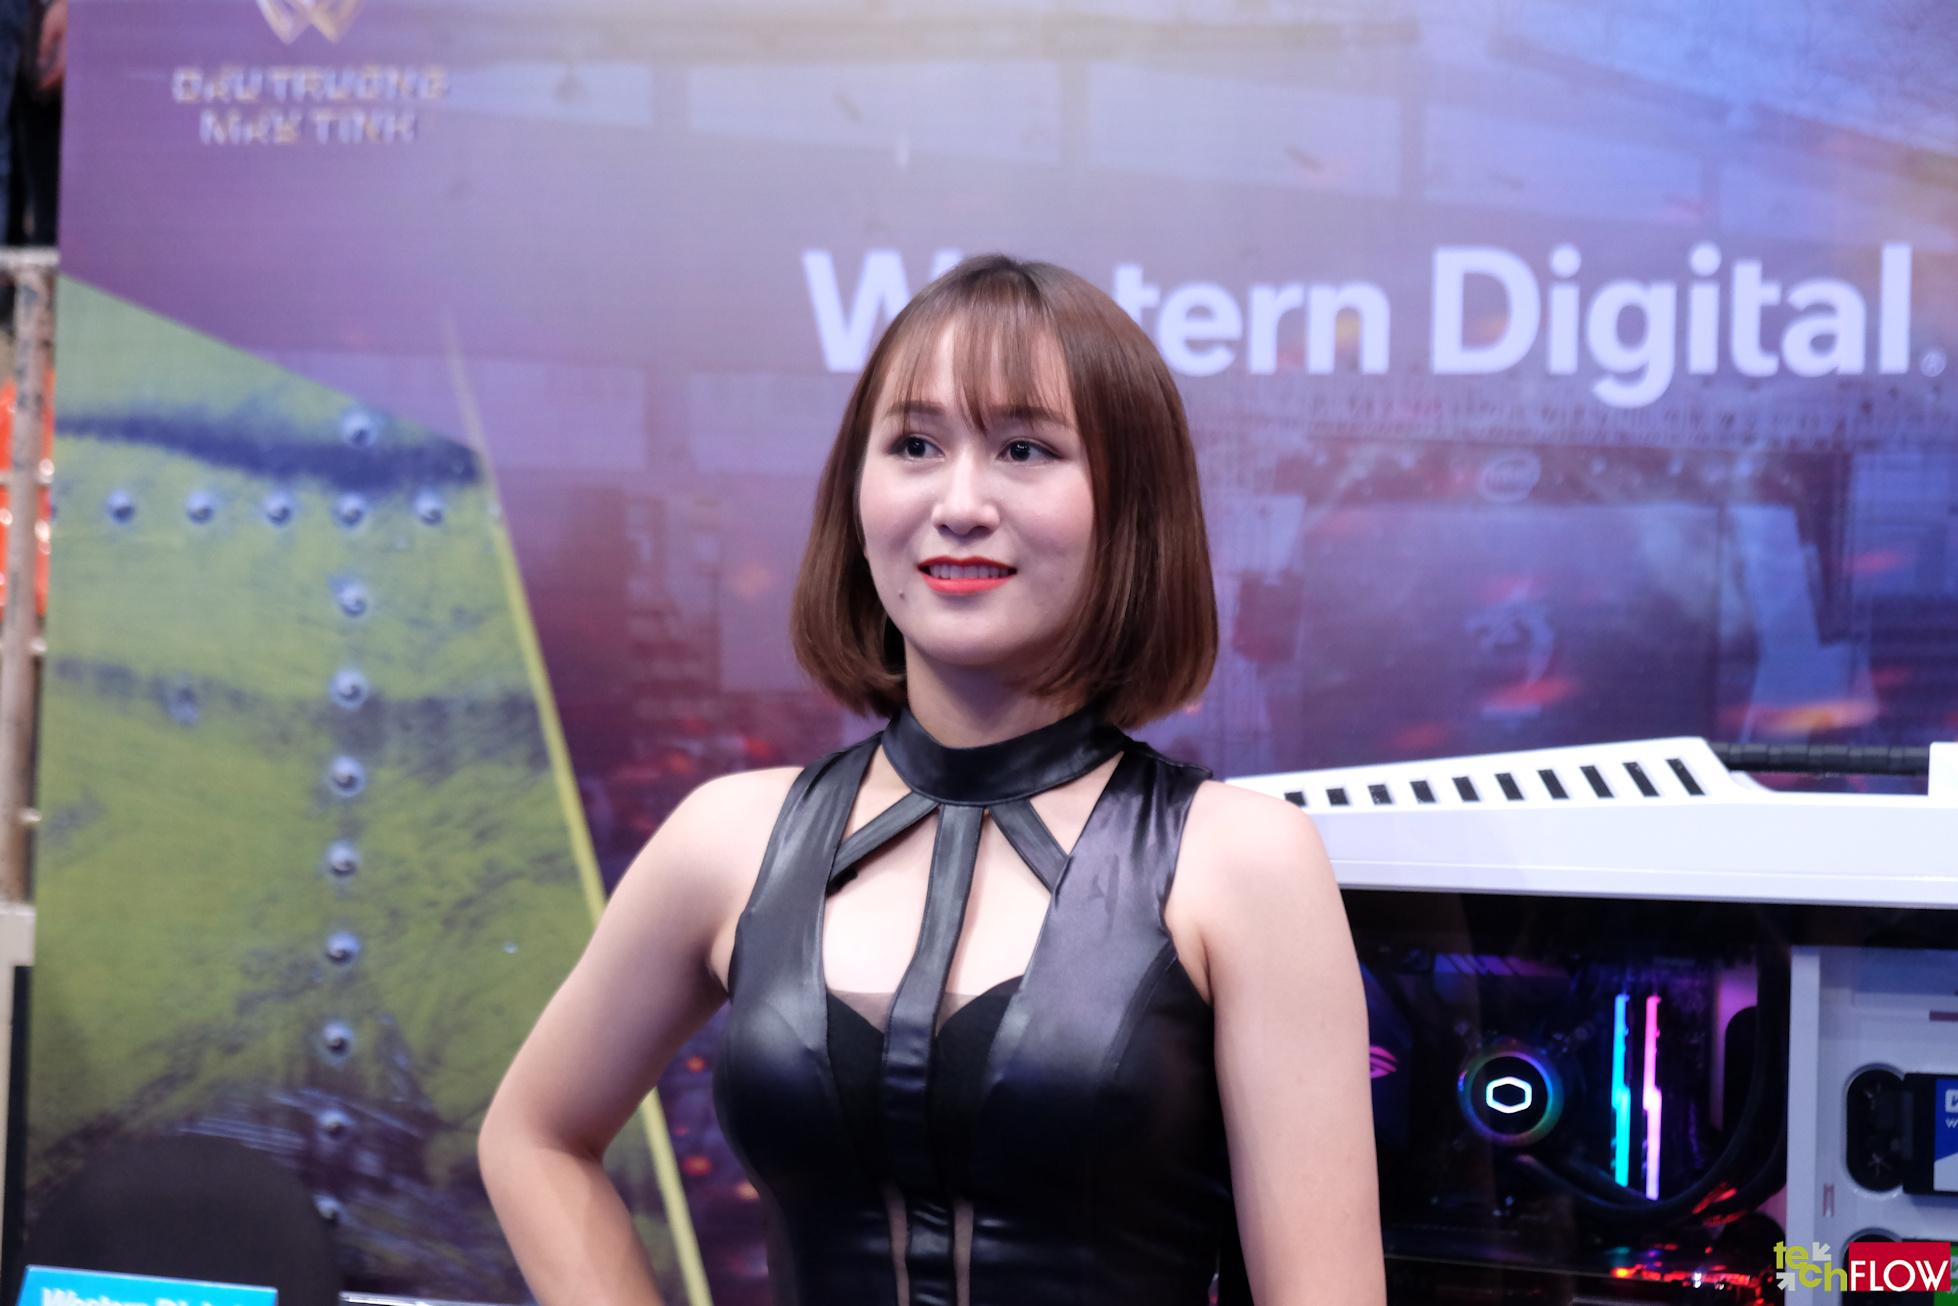 Su-Kien-Dau-Truong-May-Tinh-Mua5-099